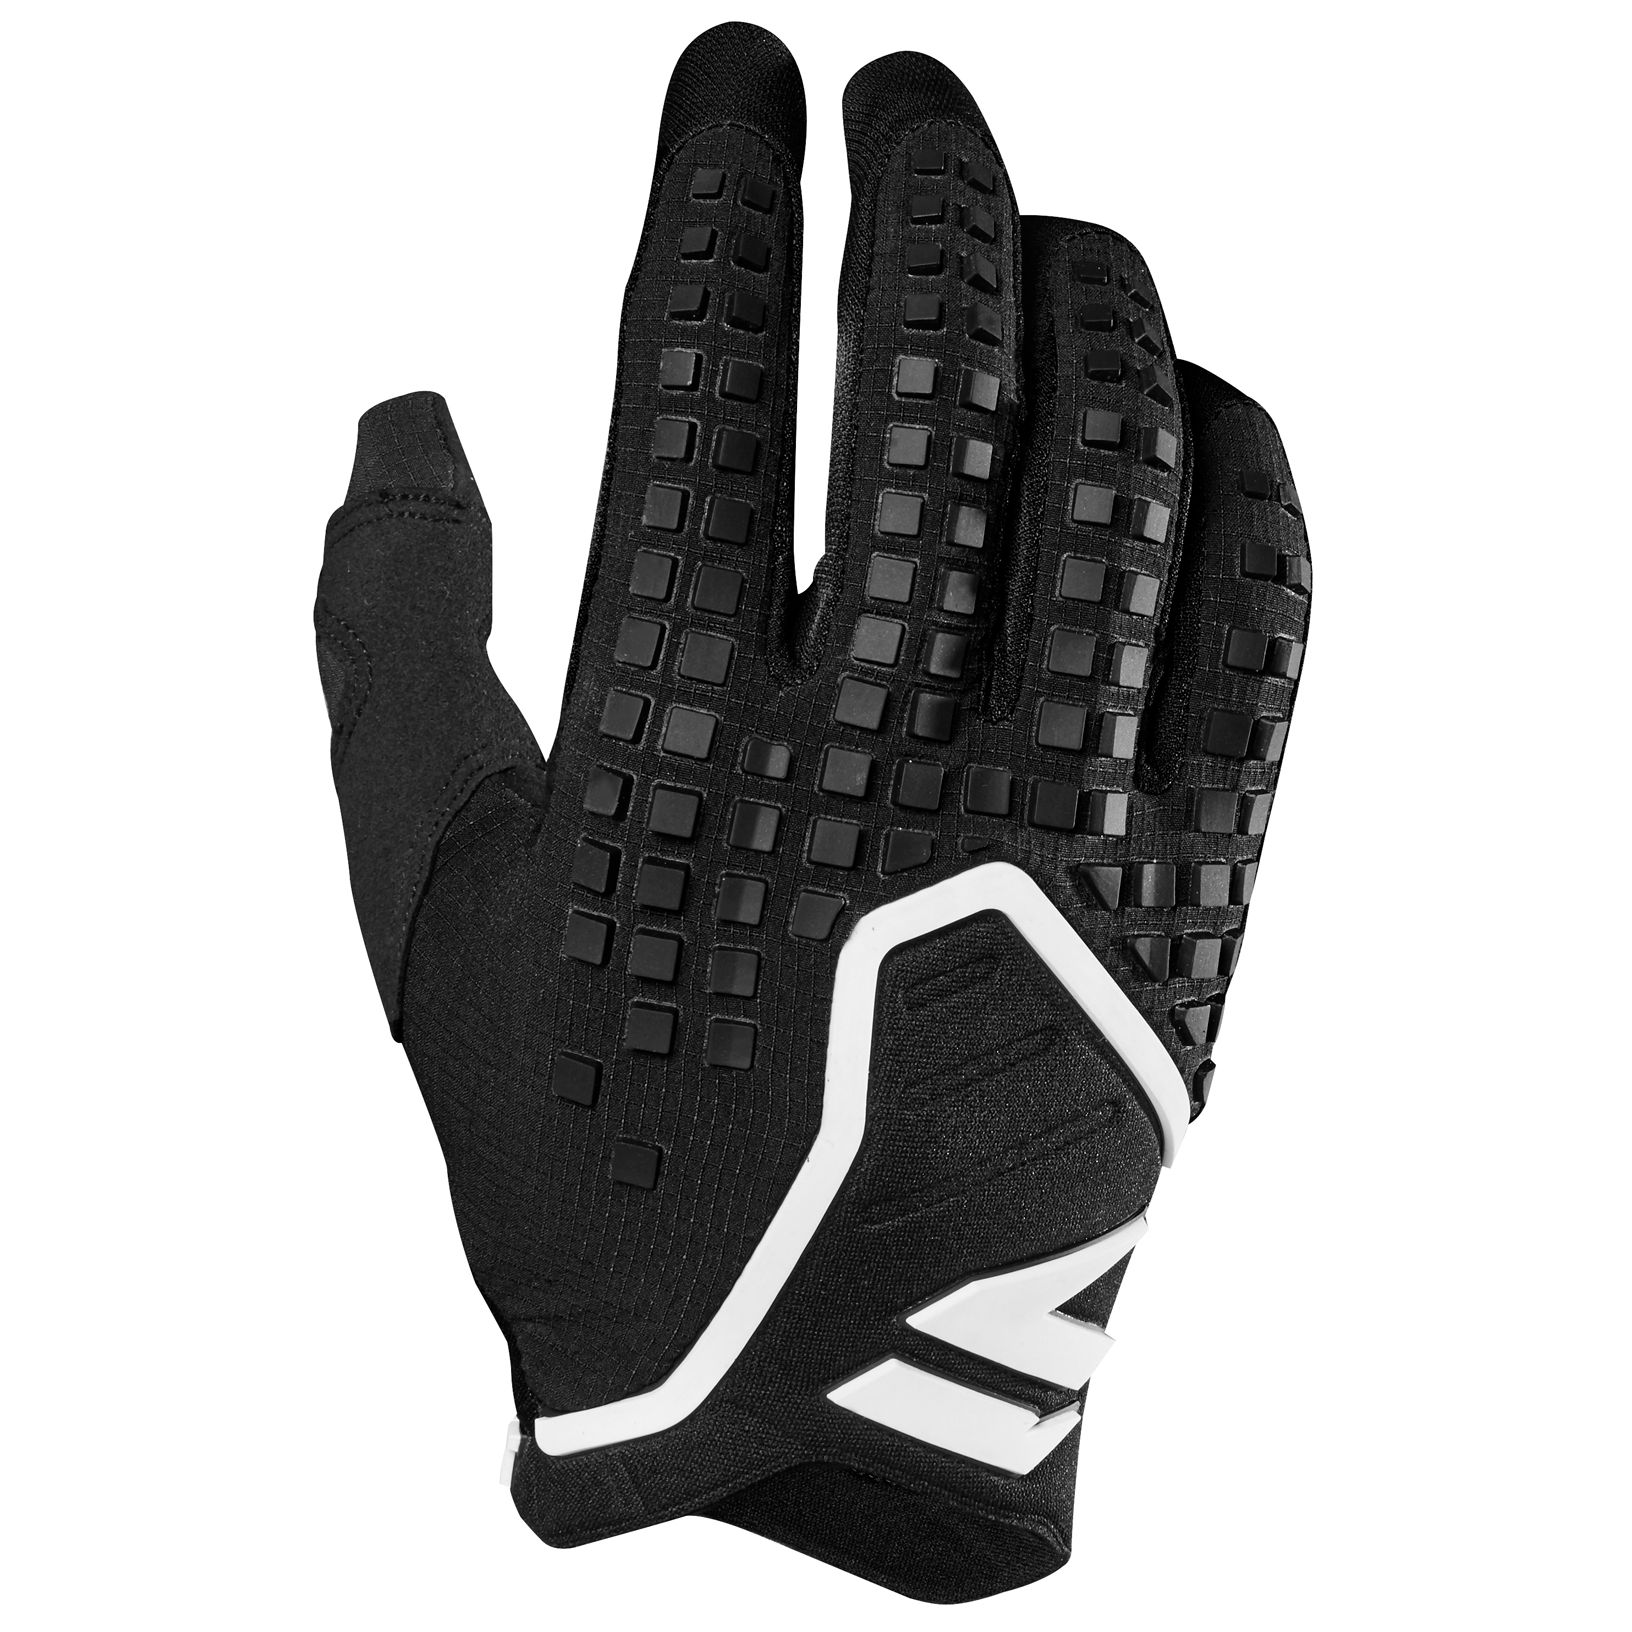 gants cross shift black pro noir 2018 tenue cross. Black Bedroom Furniture Sets. Home Design Ideas